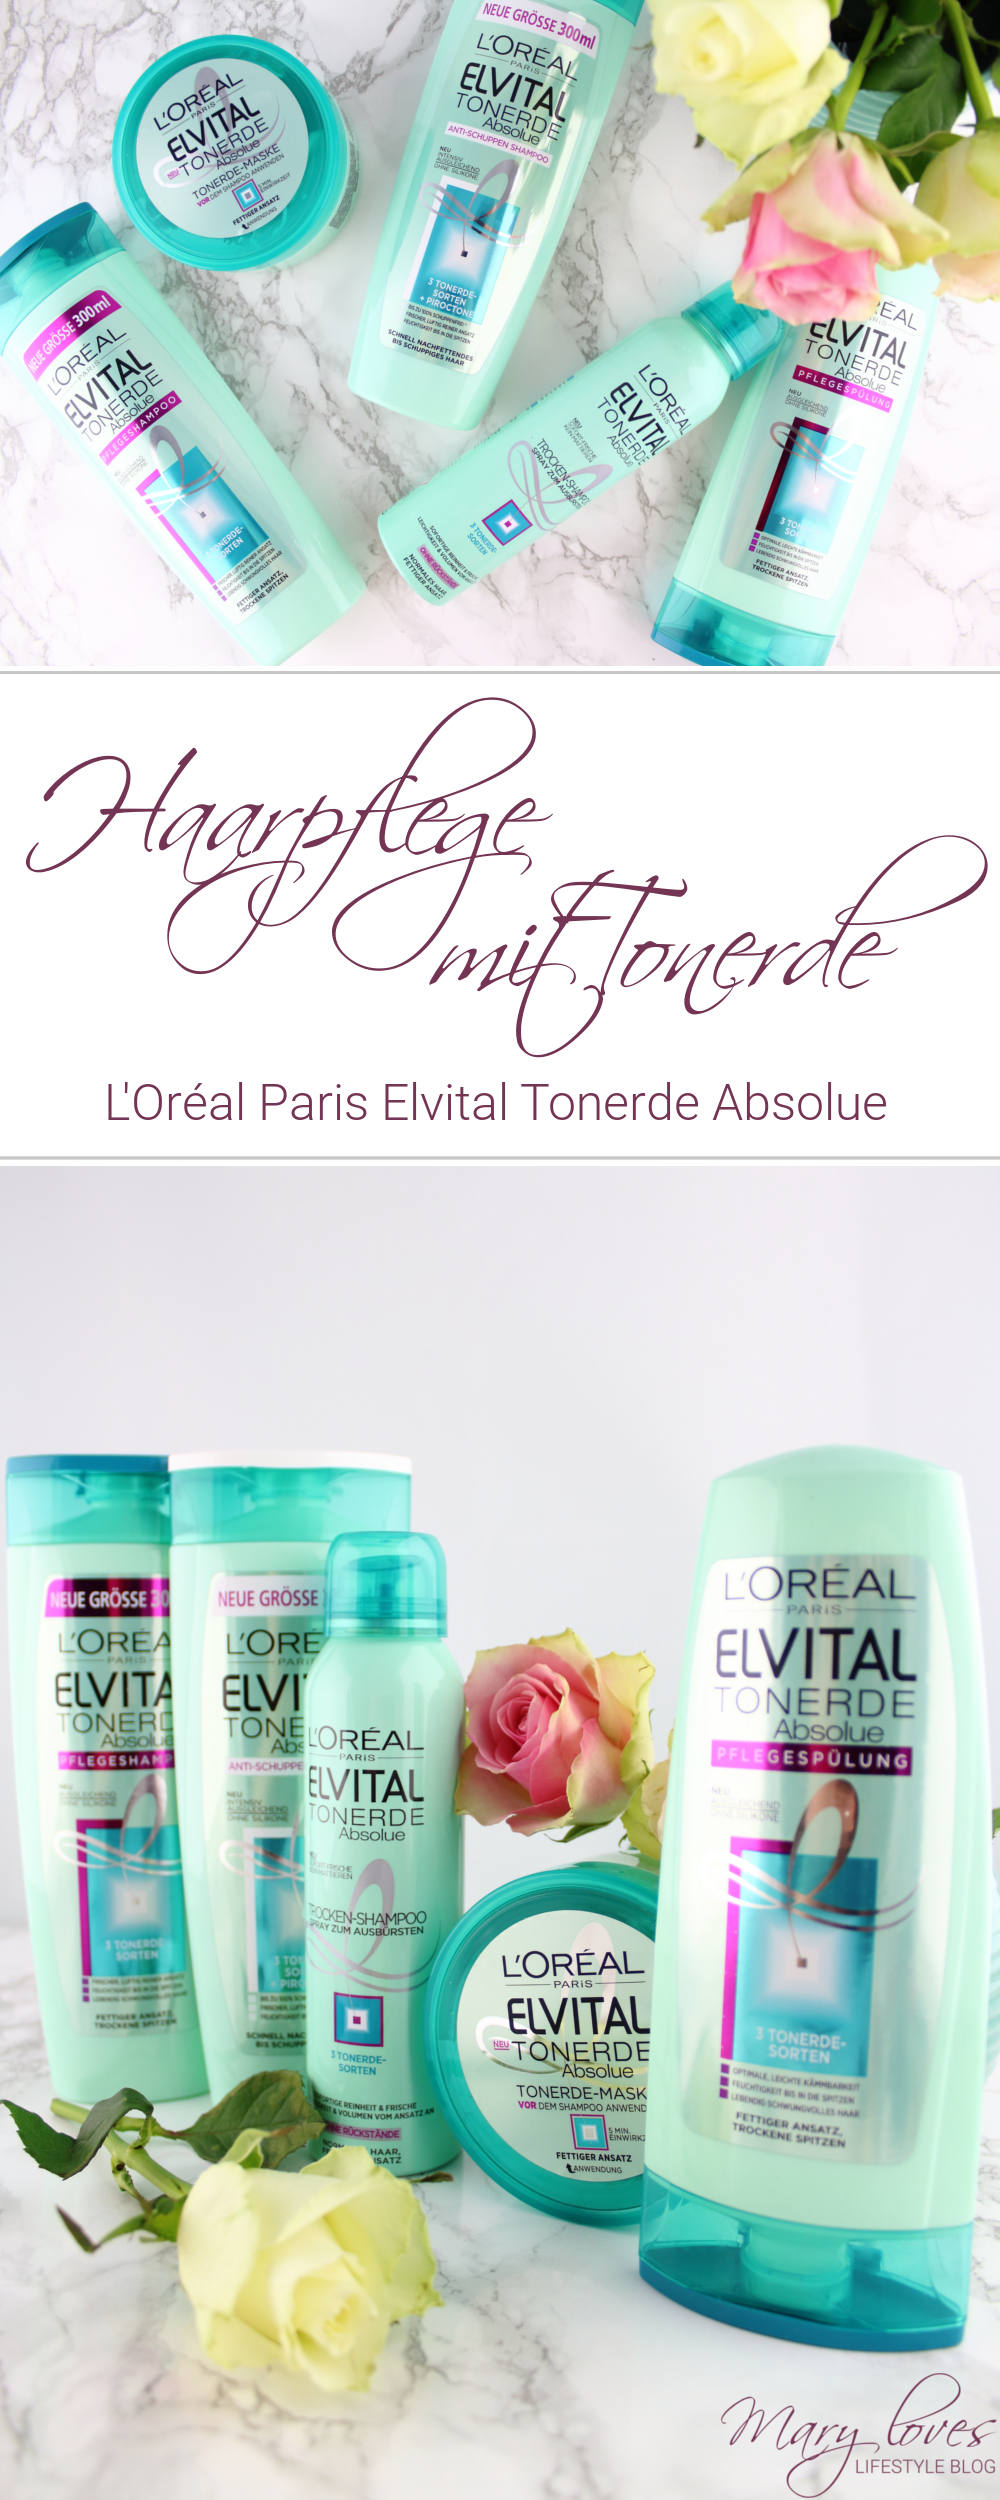 Haarpflege mit Tonerde - L'Oréal Paris Elvital Tonerde Absolue Haarpflege-Serie im Test - Haarpflegeprodukte mit Tonerde - Tonerde-Maske - Trocken-Shampoo - Tonerde Pflegespülung - Anti-Schuppen Shampoo